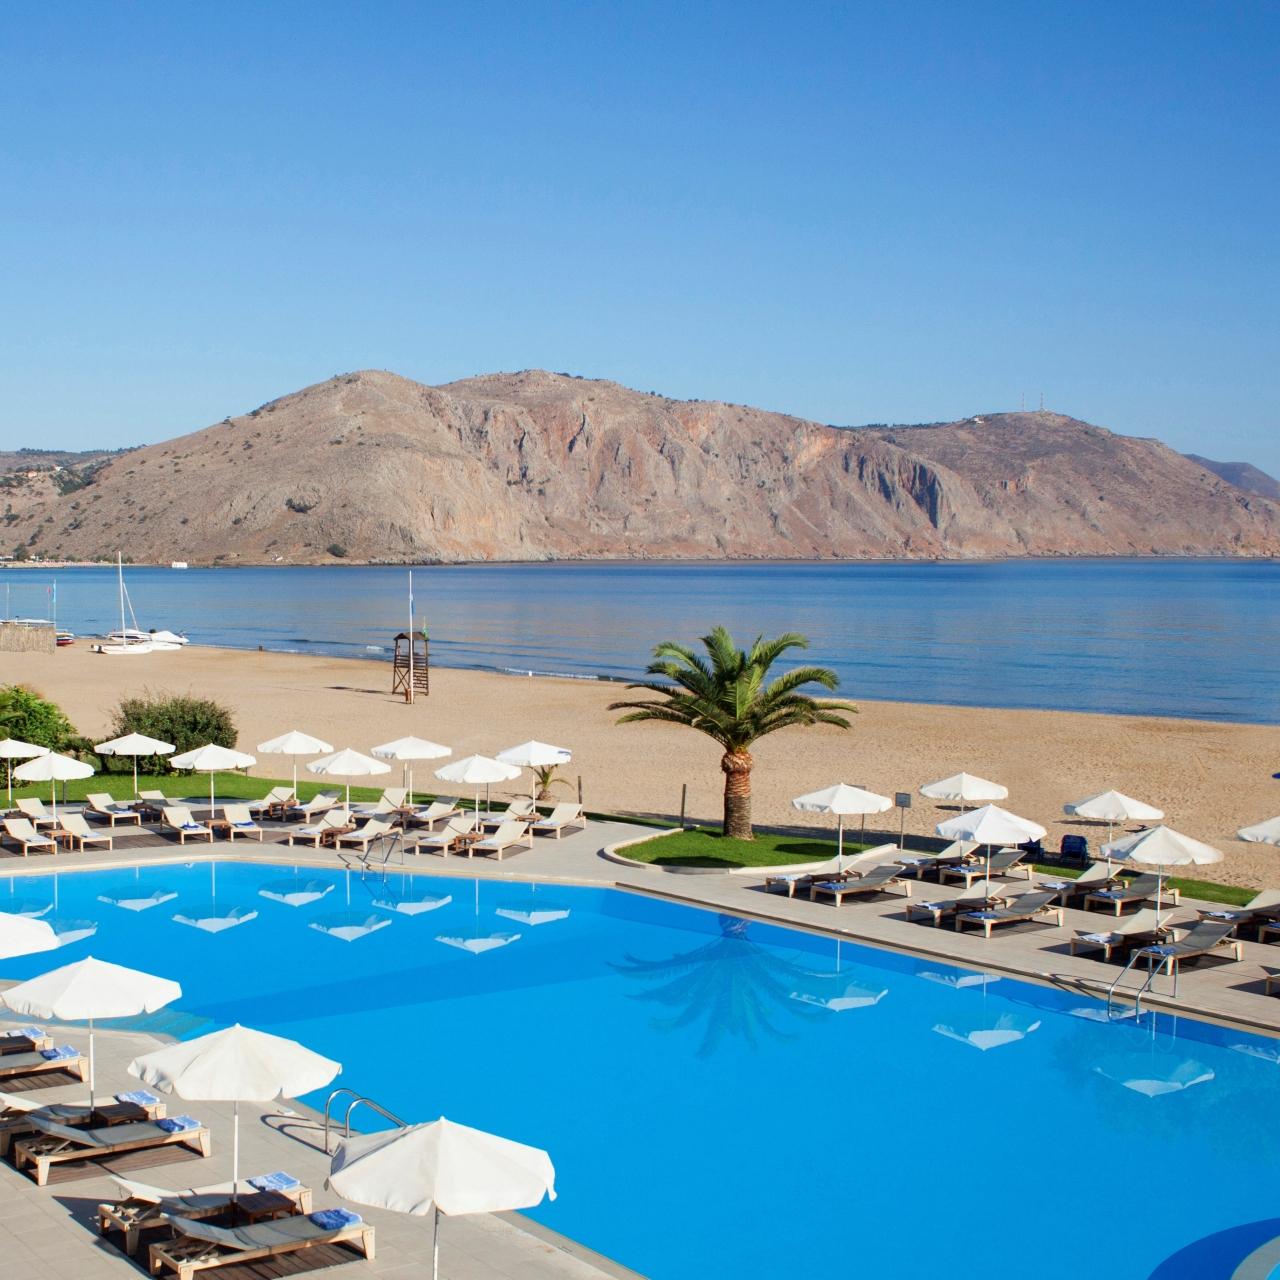 Kreta, Griechenland: 5* Hotel Pilot Beach Resort - Superior Bungalow Poolblick - Halbpension (VP +20€/Zimmer) / gratis Storno / 2020 & 2021